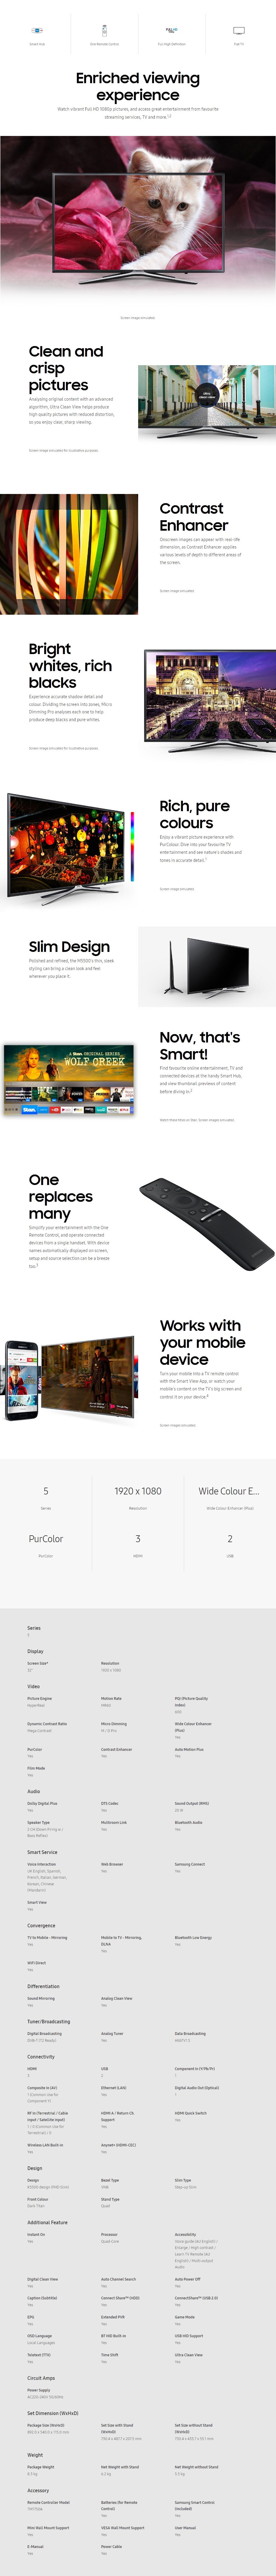 "Samsung Series 5 M5500 32"" FHD Smart TV - Overview 1"